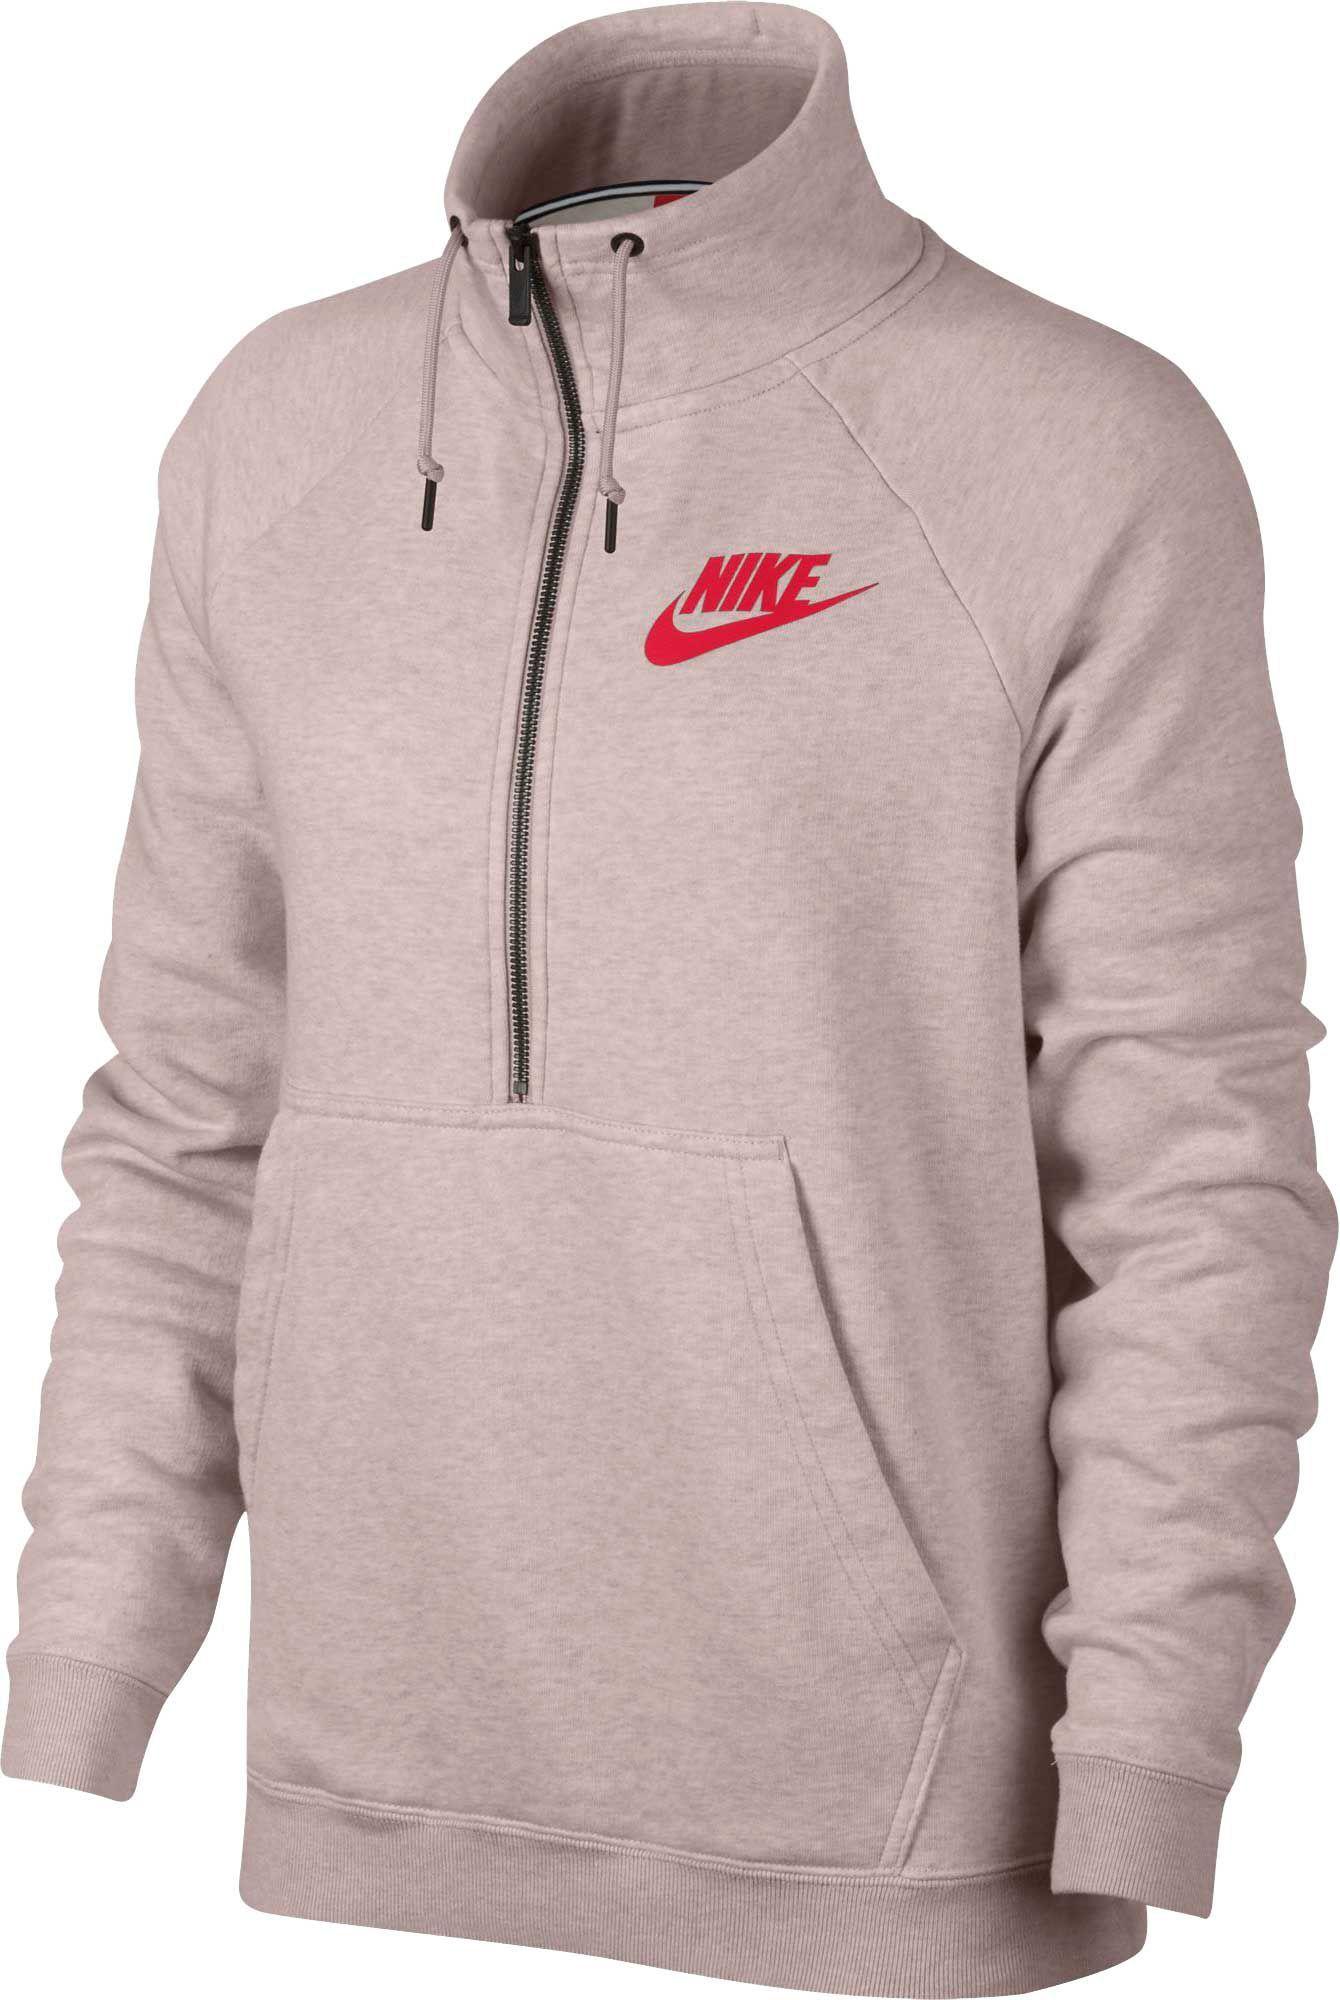 54ff61e2e0c9 Nike Women s Sportswear Rally Half-Zip Sweatshirt